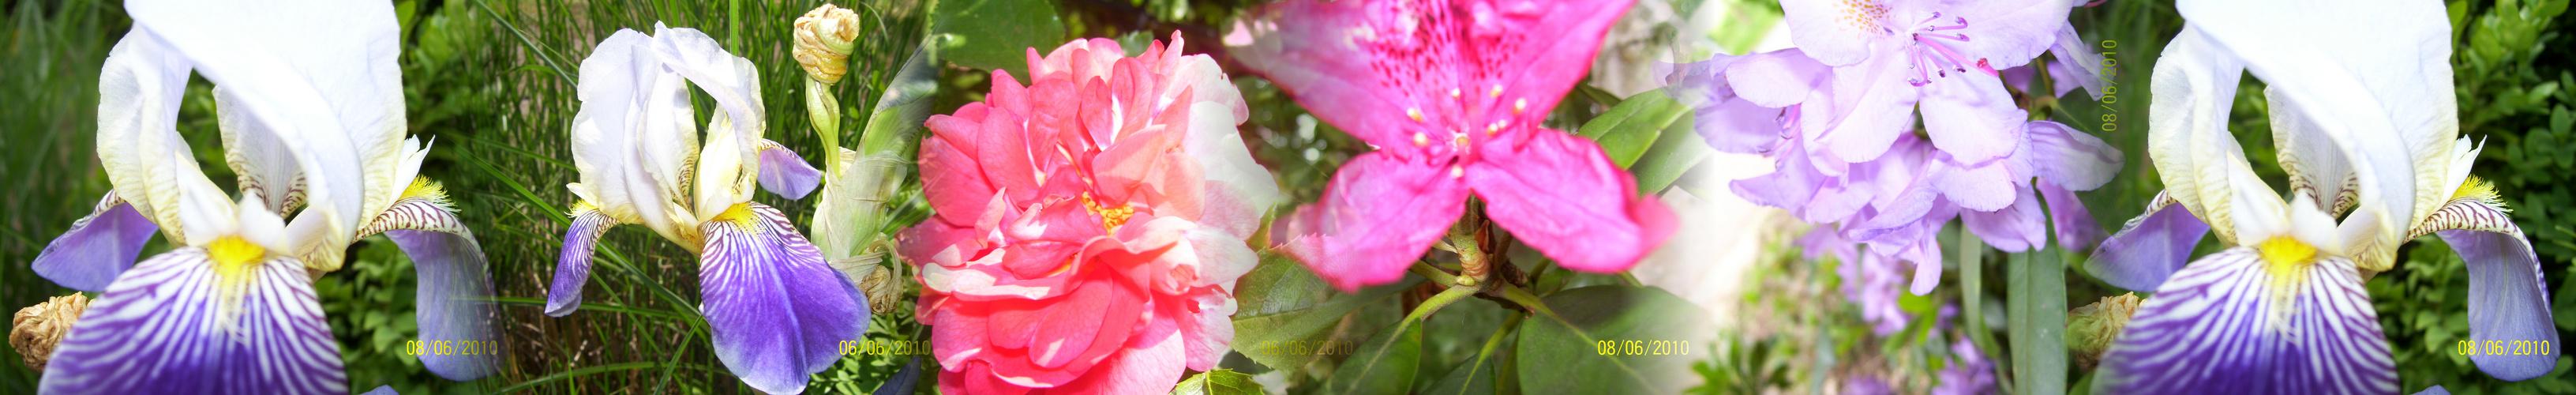 Panorama:Blume